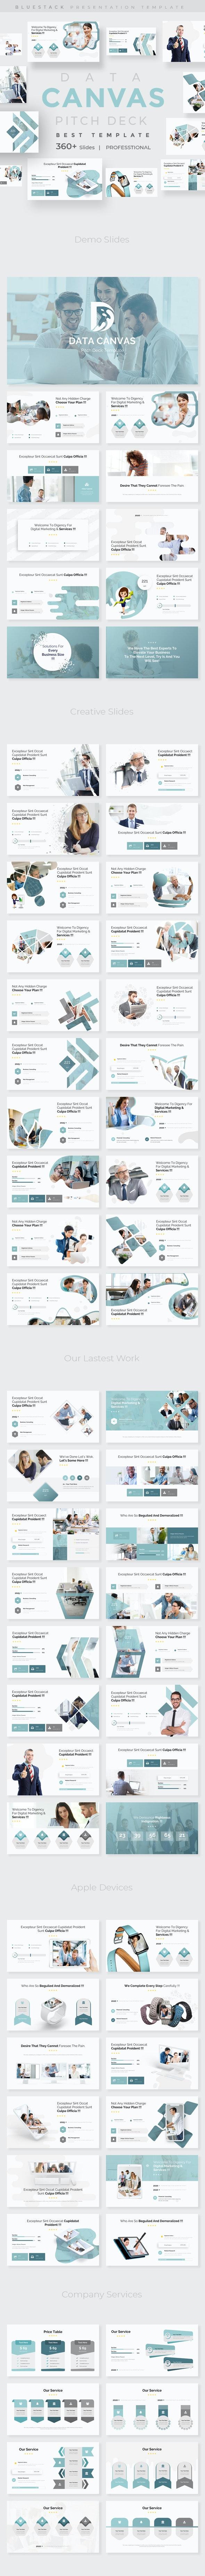 Data Canvas Pitch Deck Google Slide Template - Google Slides Presentation Templates